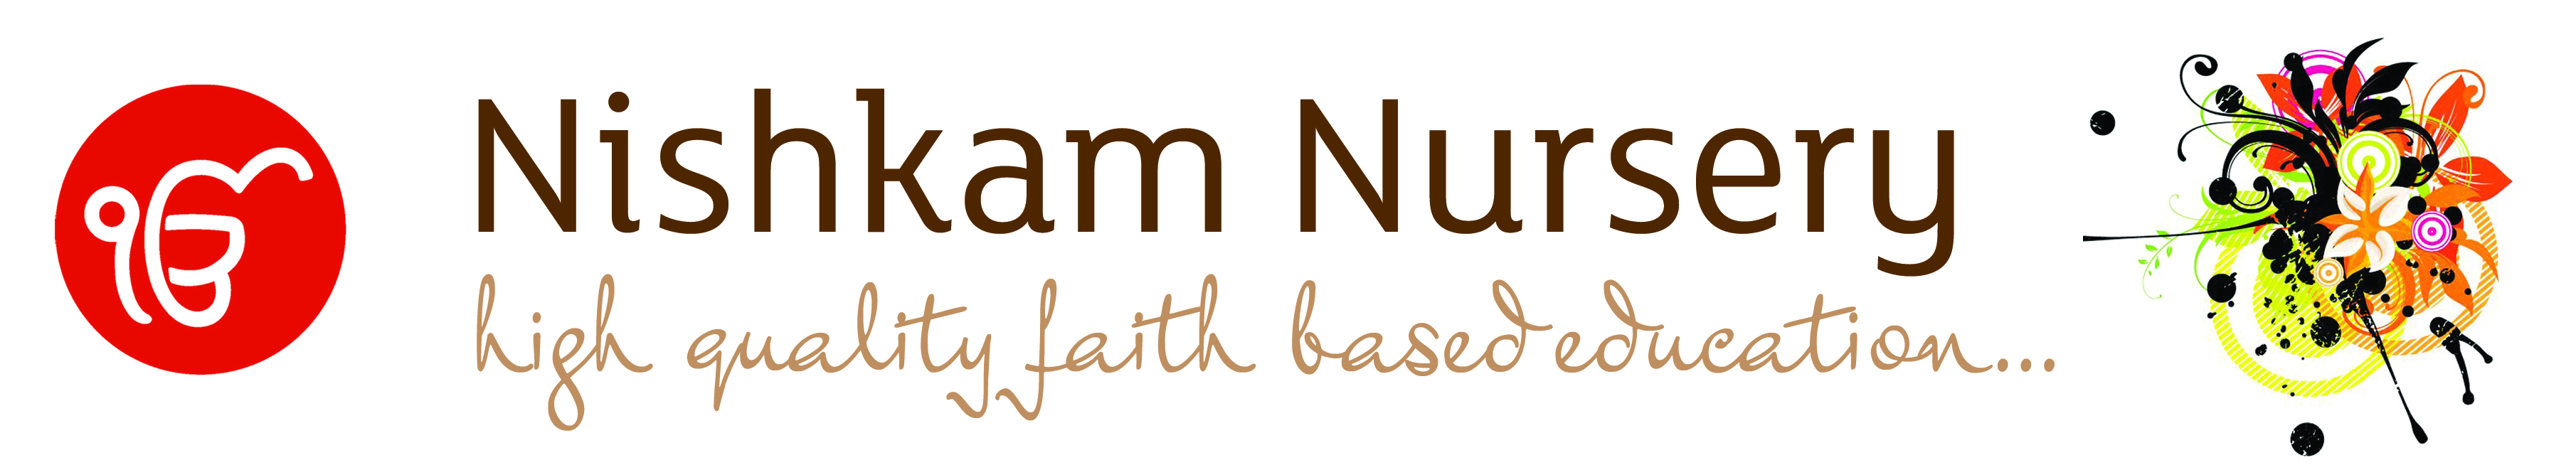 Nishkam Nursery | Birmingham